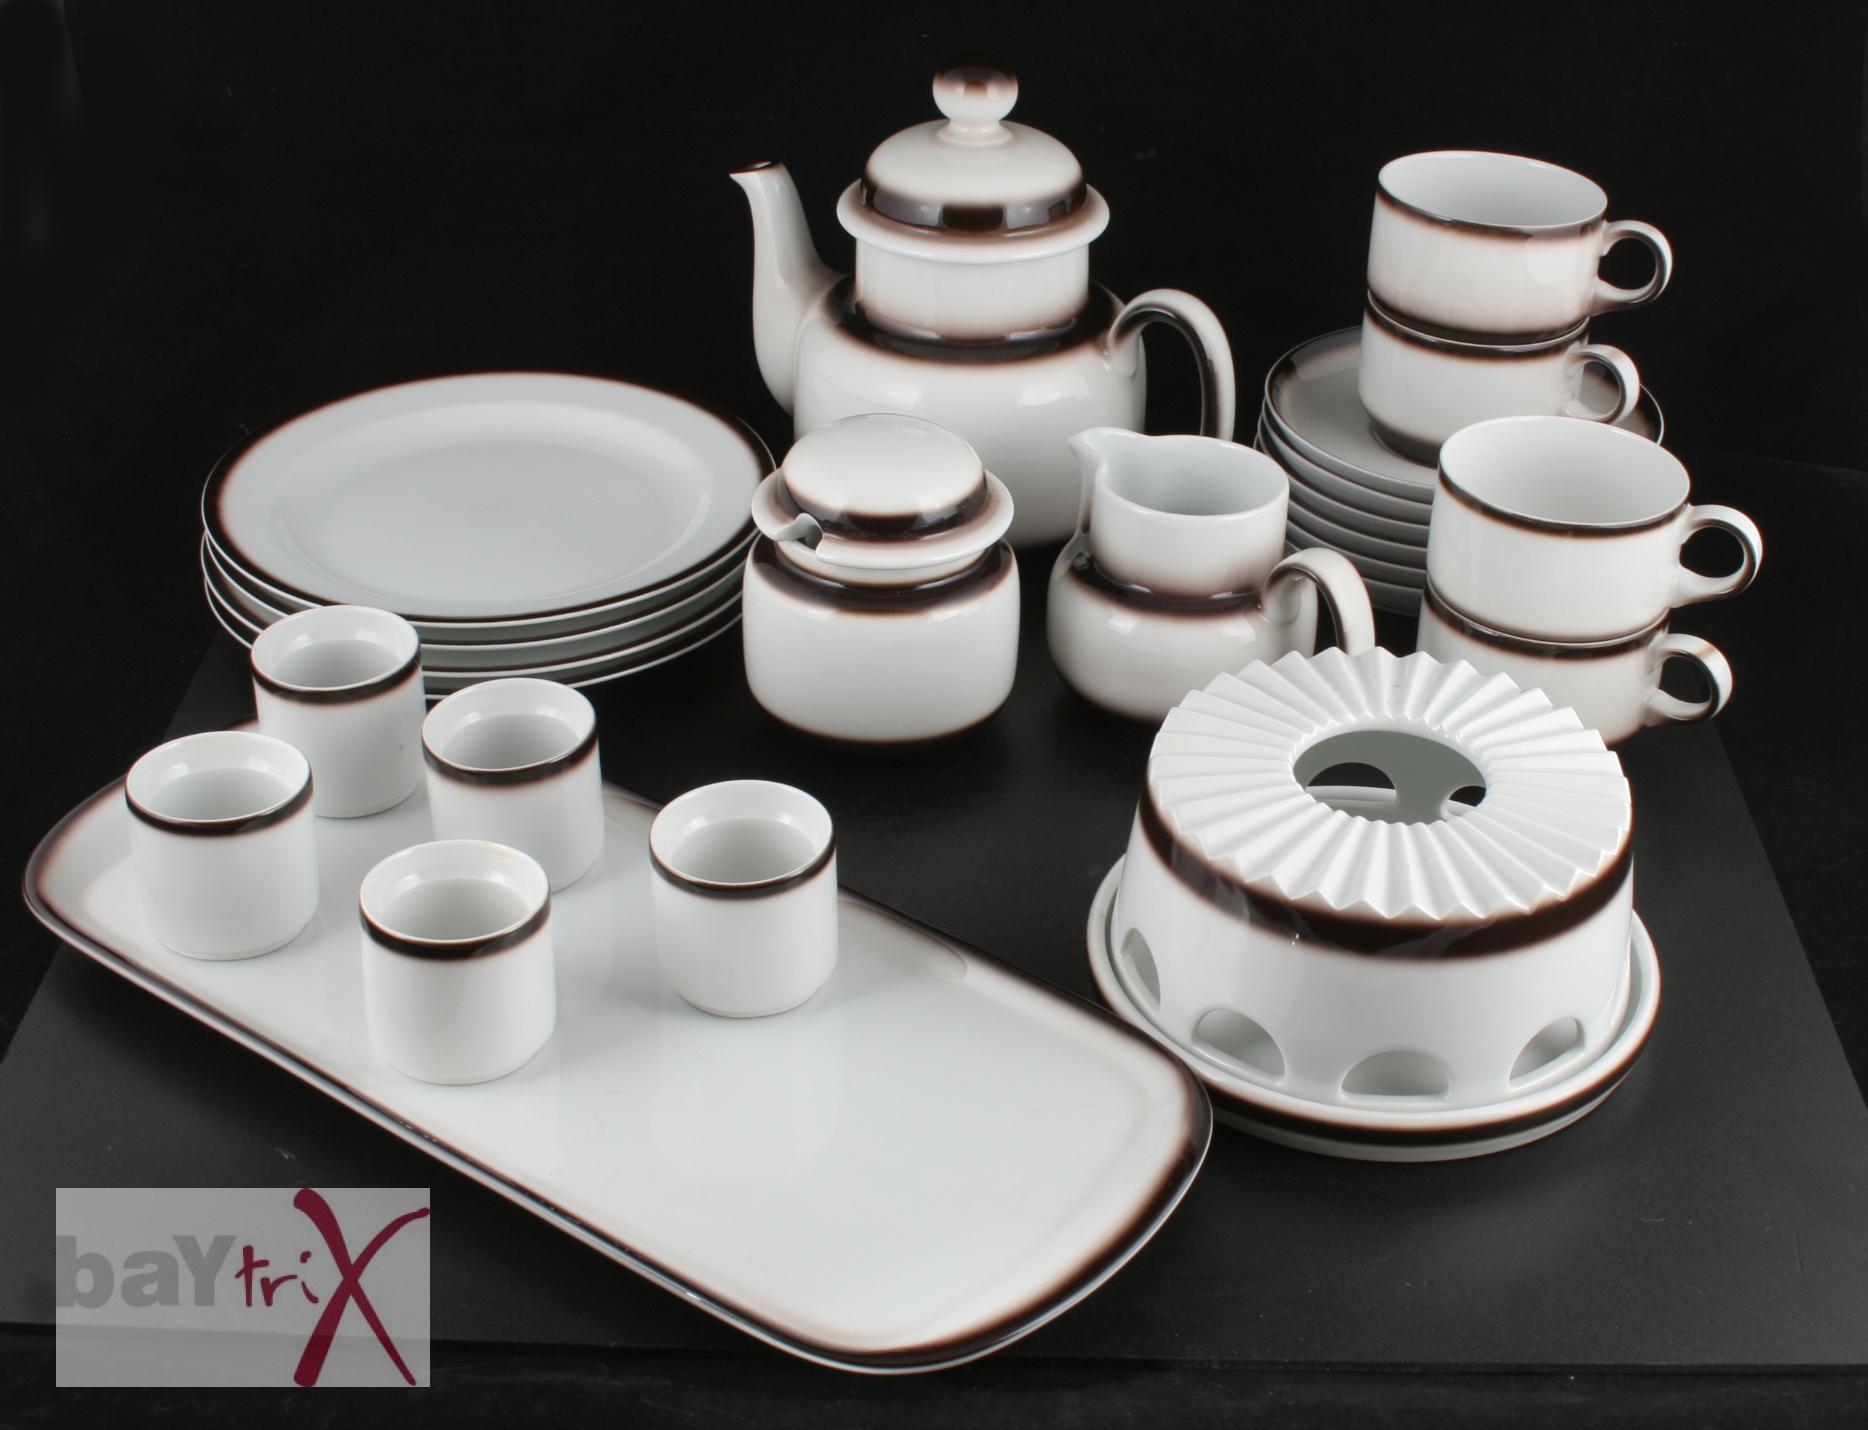 arzberg kaffeeservice f r 4 personen ersatz tasse teller st vchen kanne eier ebay. Black Bedroom Furniture Sets. Home Design Ideas